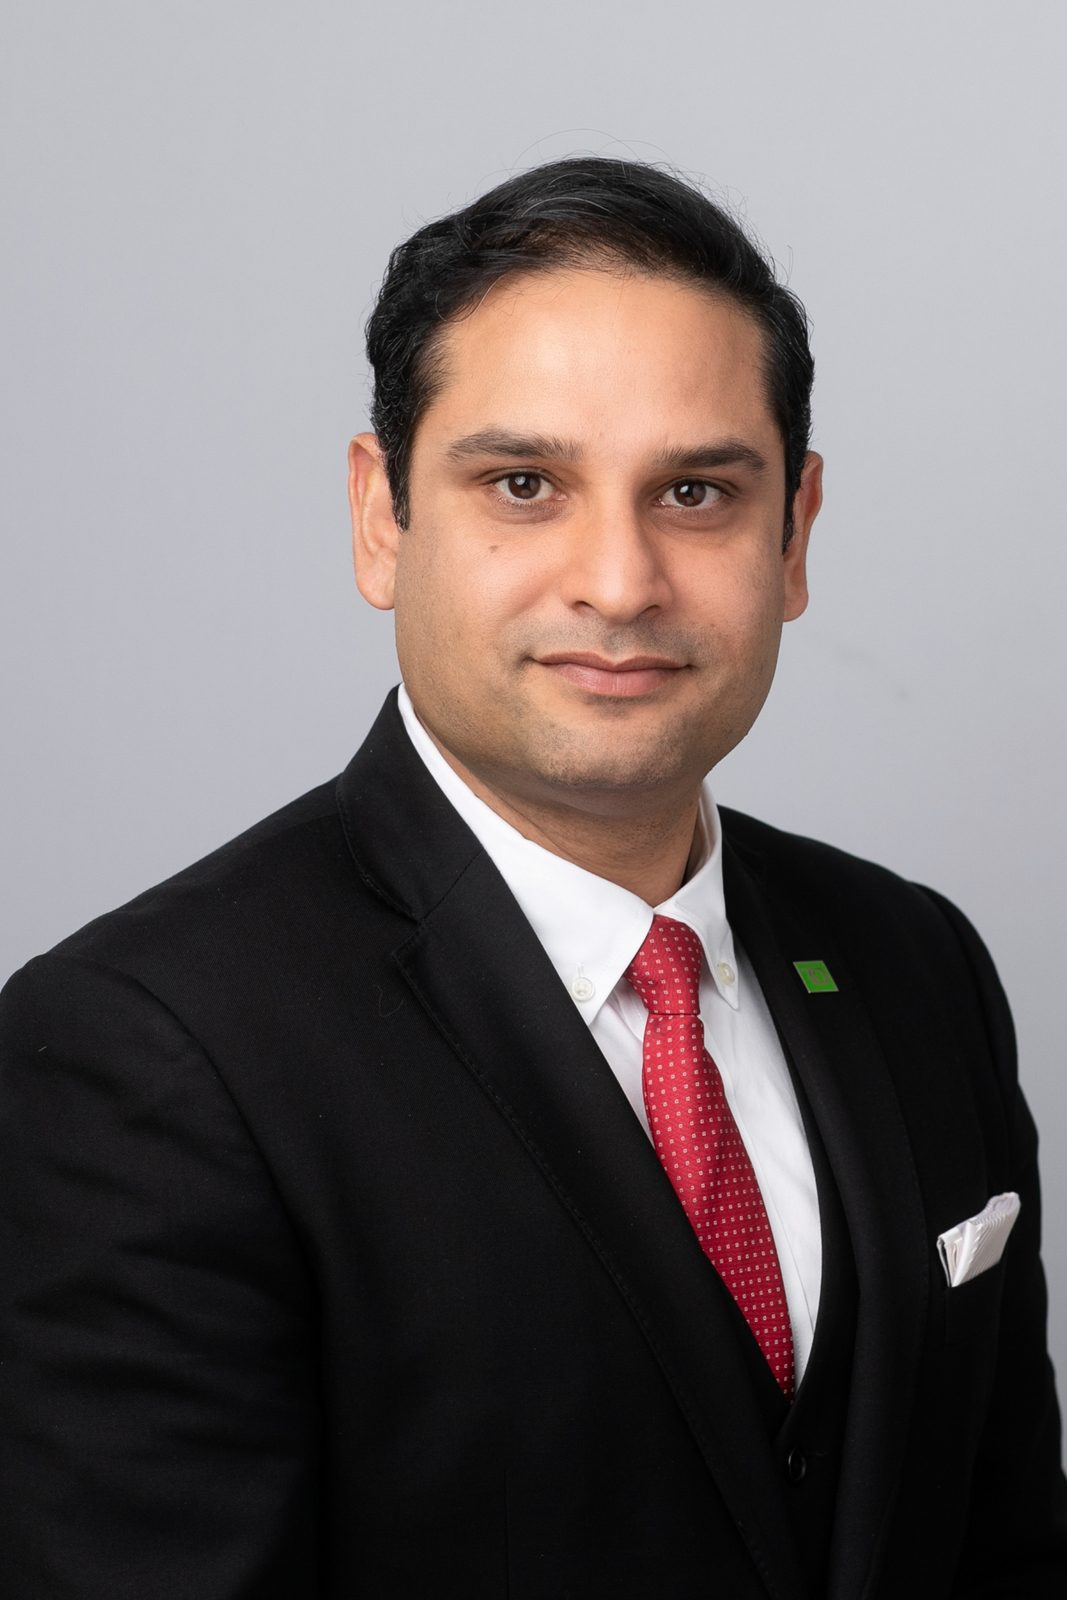 Gaurav Sharma - TD Financial Planner Coquitlam (604)927-5729